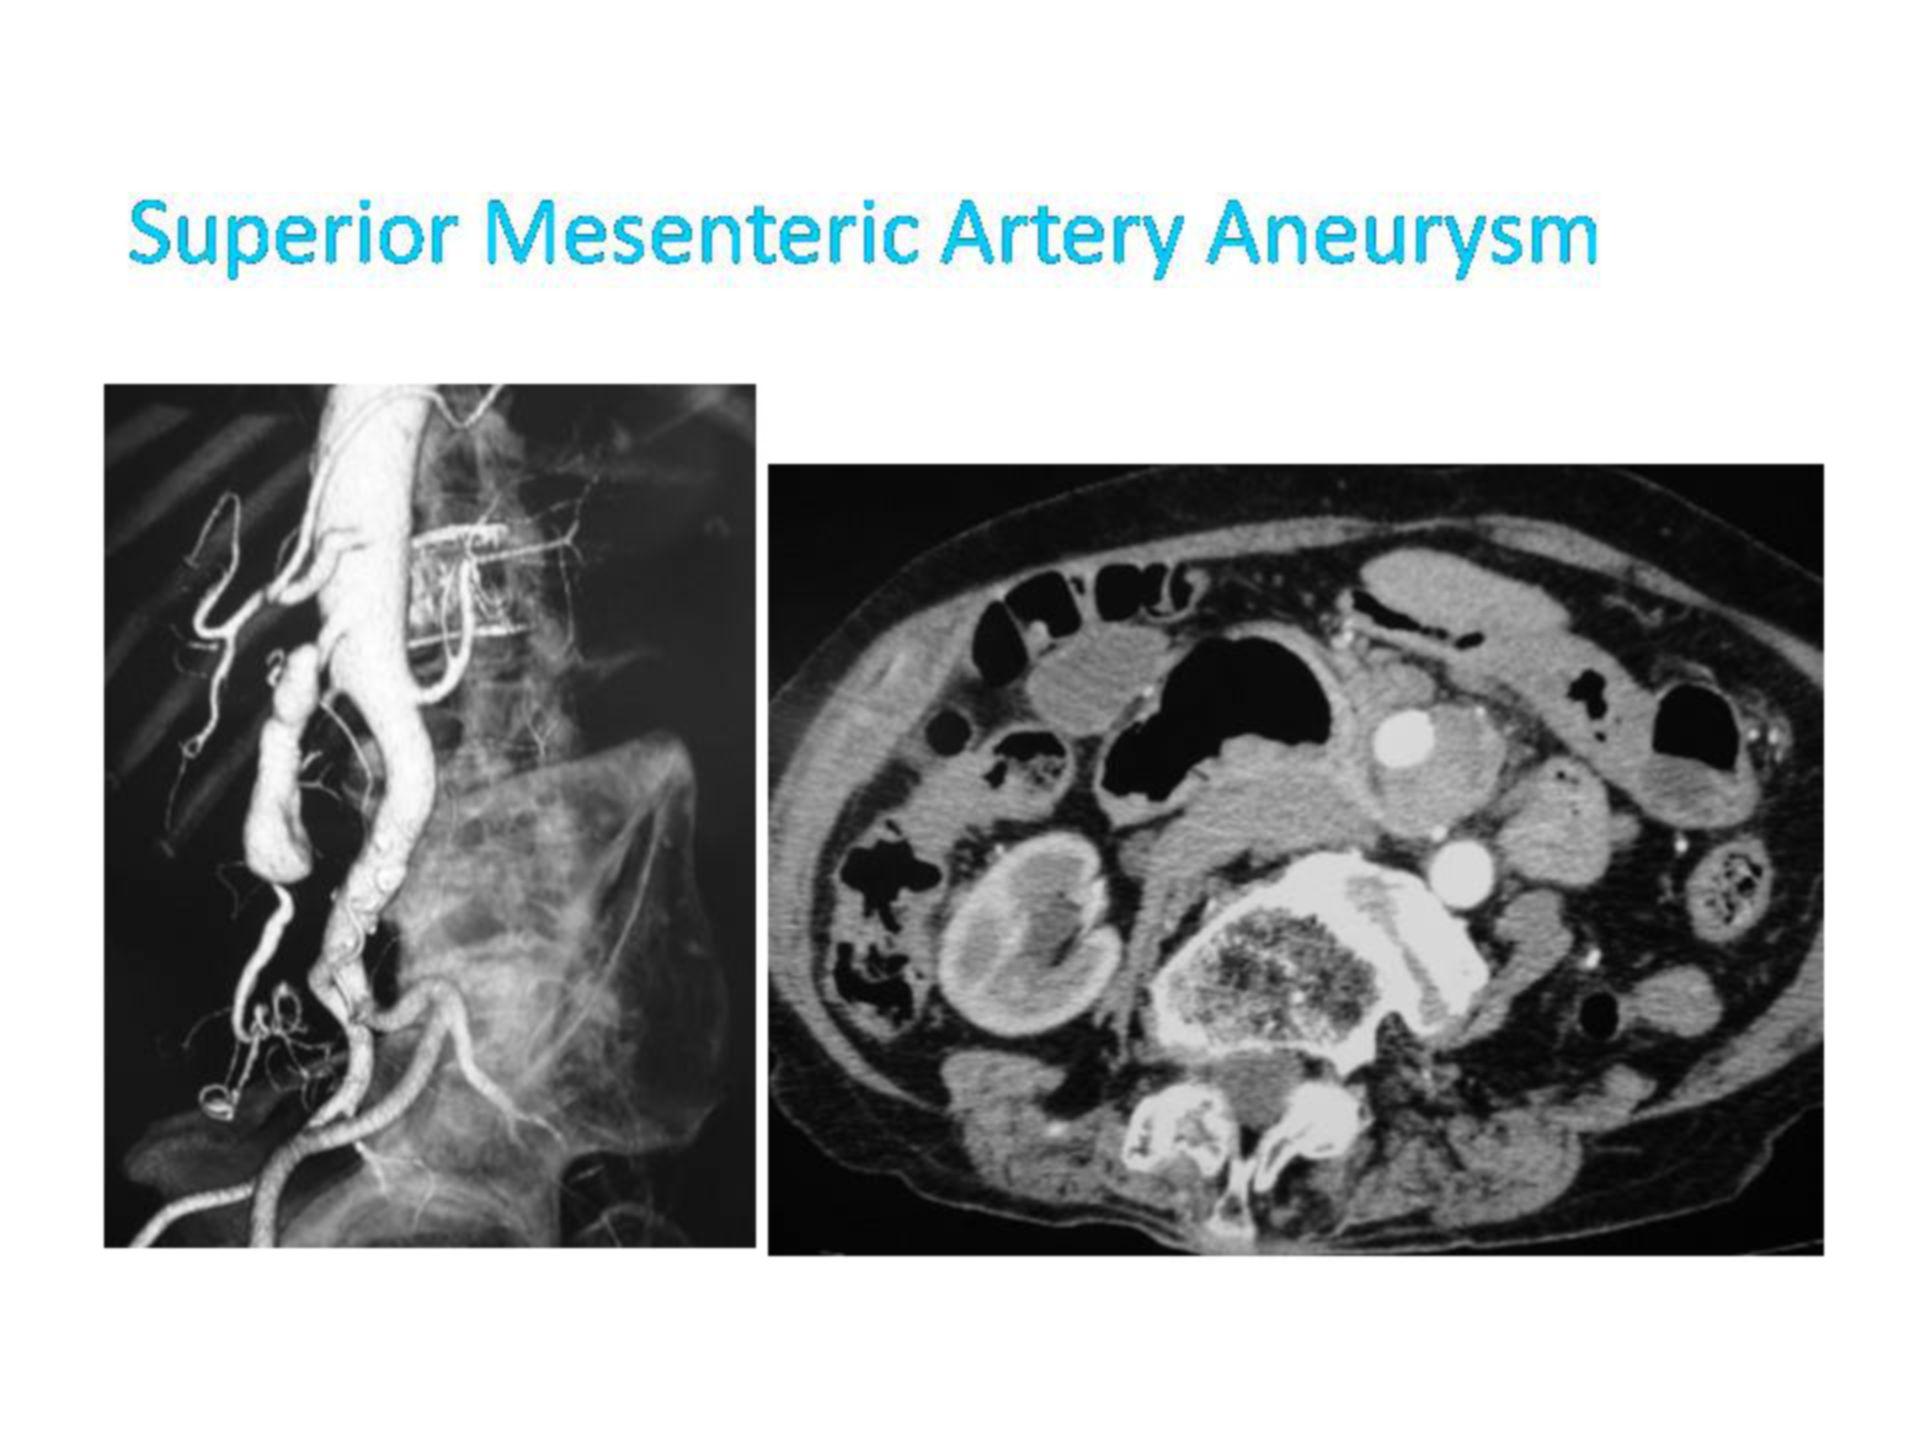 Aneurysma in der Arteria mesenterica superior (2)